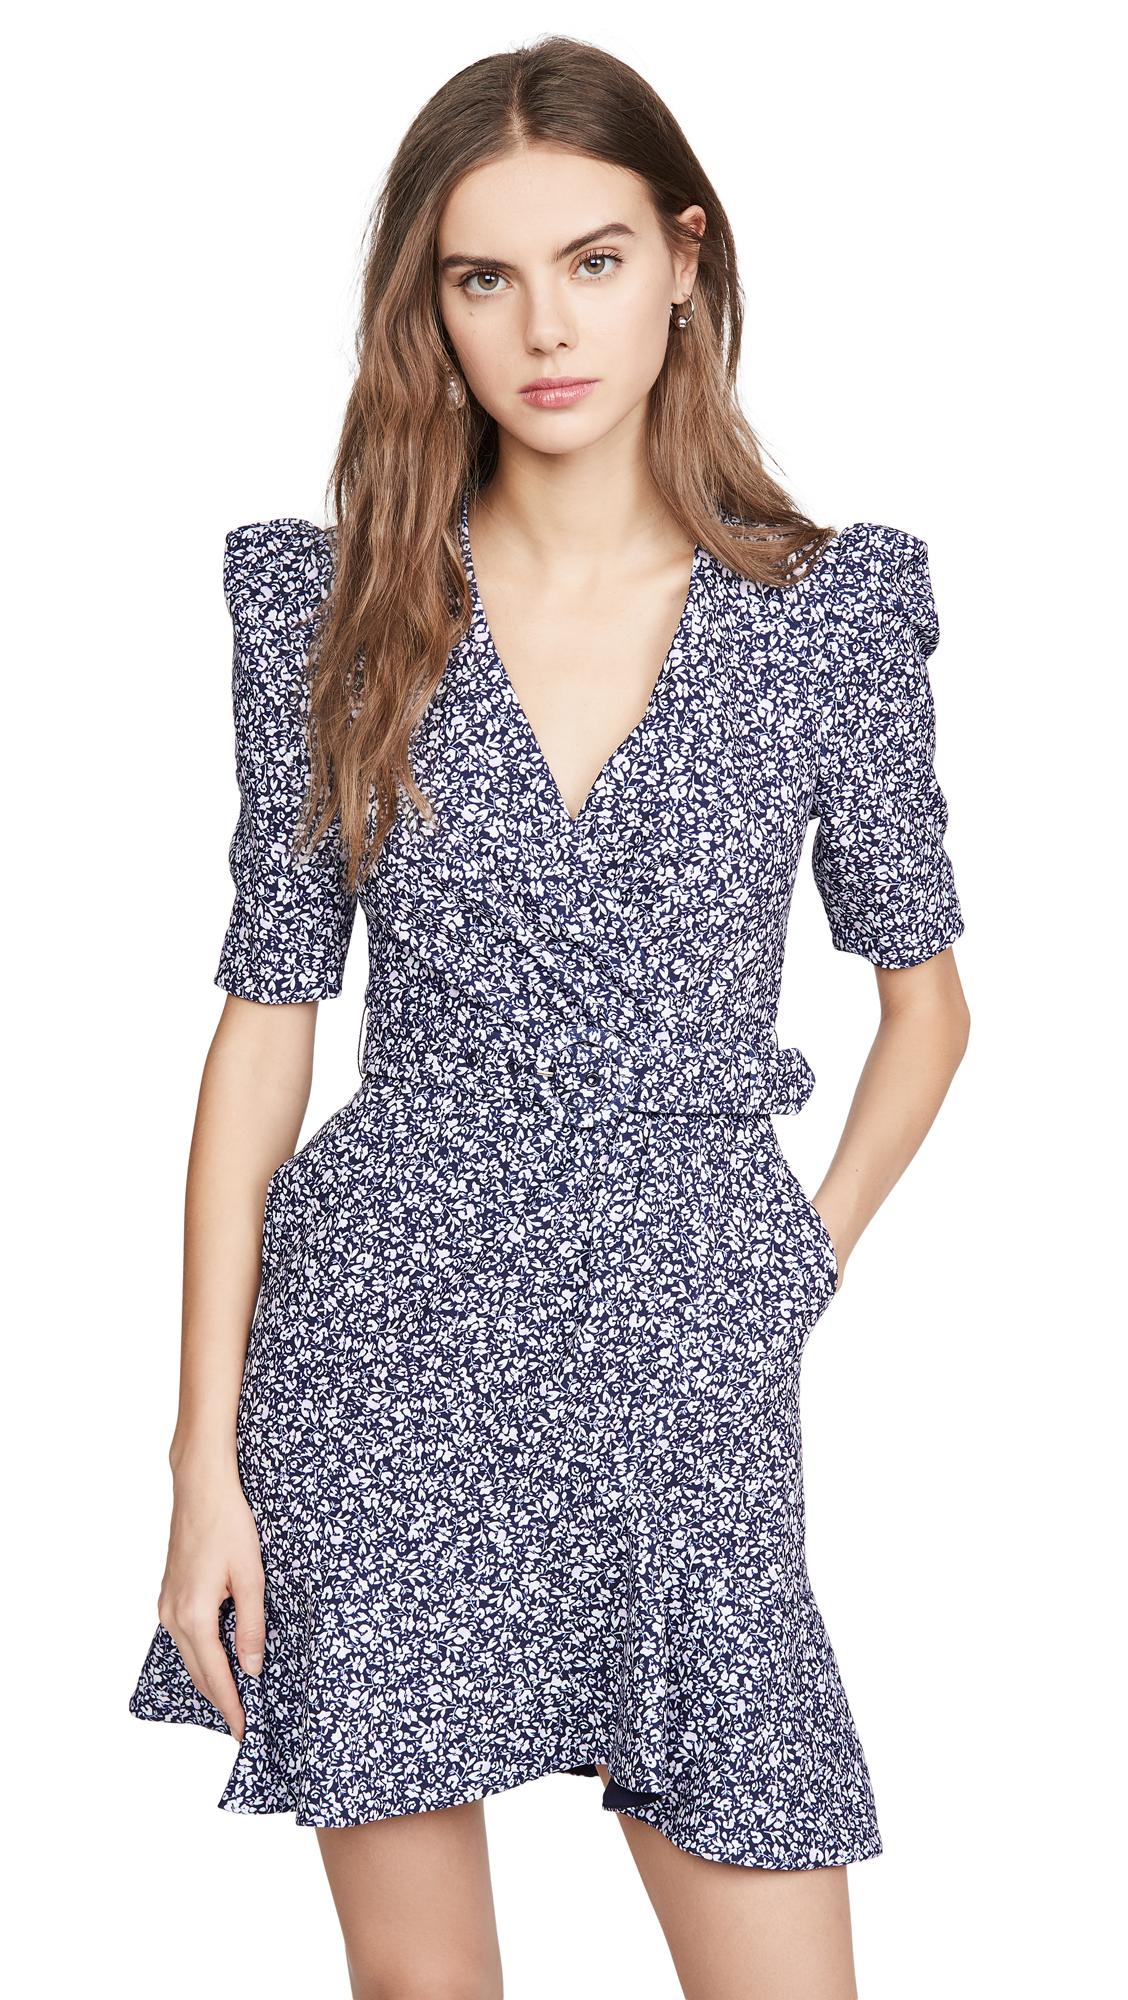 Jonathan Simkhai Evelyn Floral Crepe Dress - 30% Off Sale